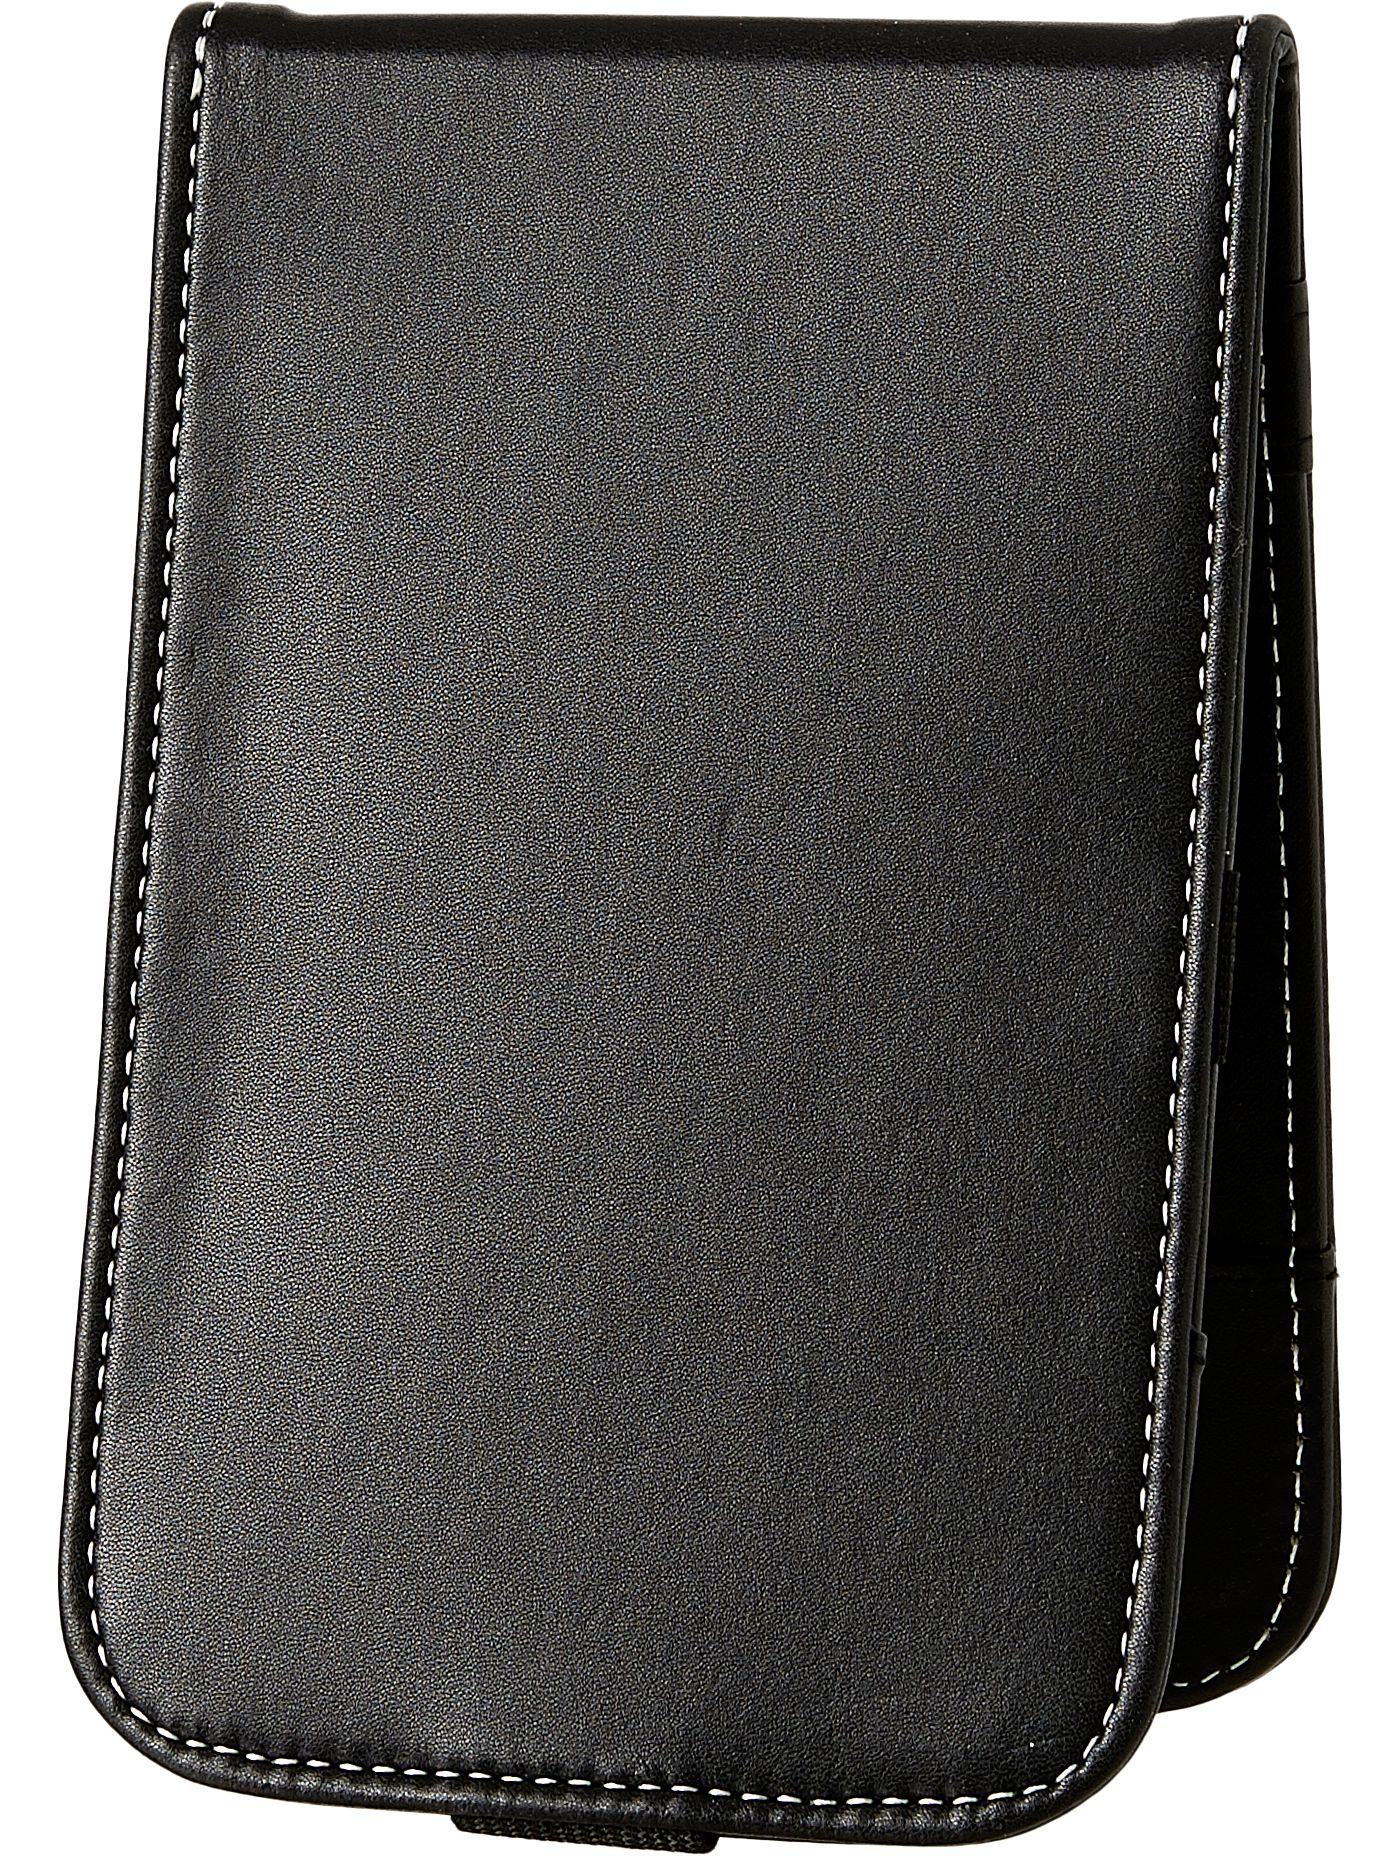 Maxfli Leather Scorecard Holder